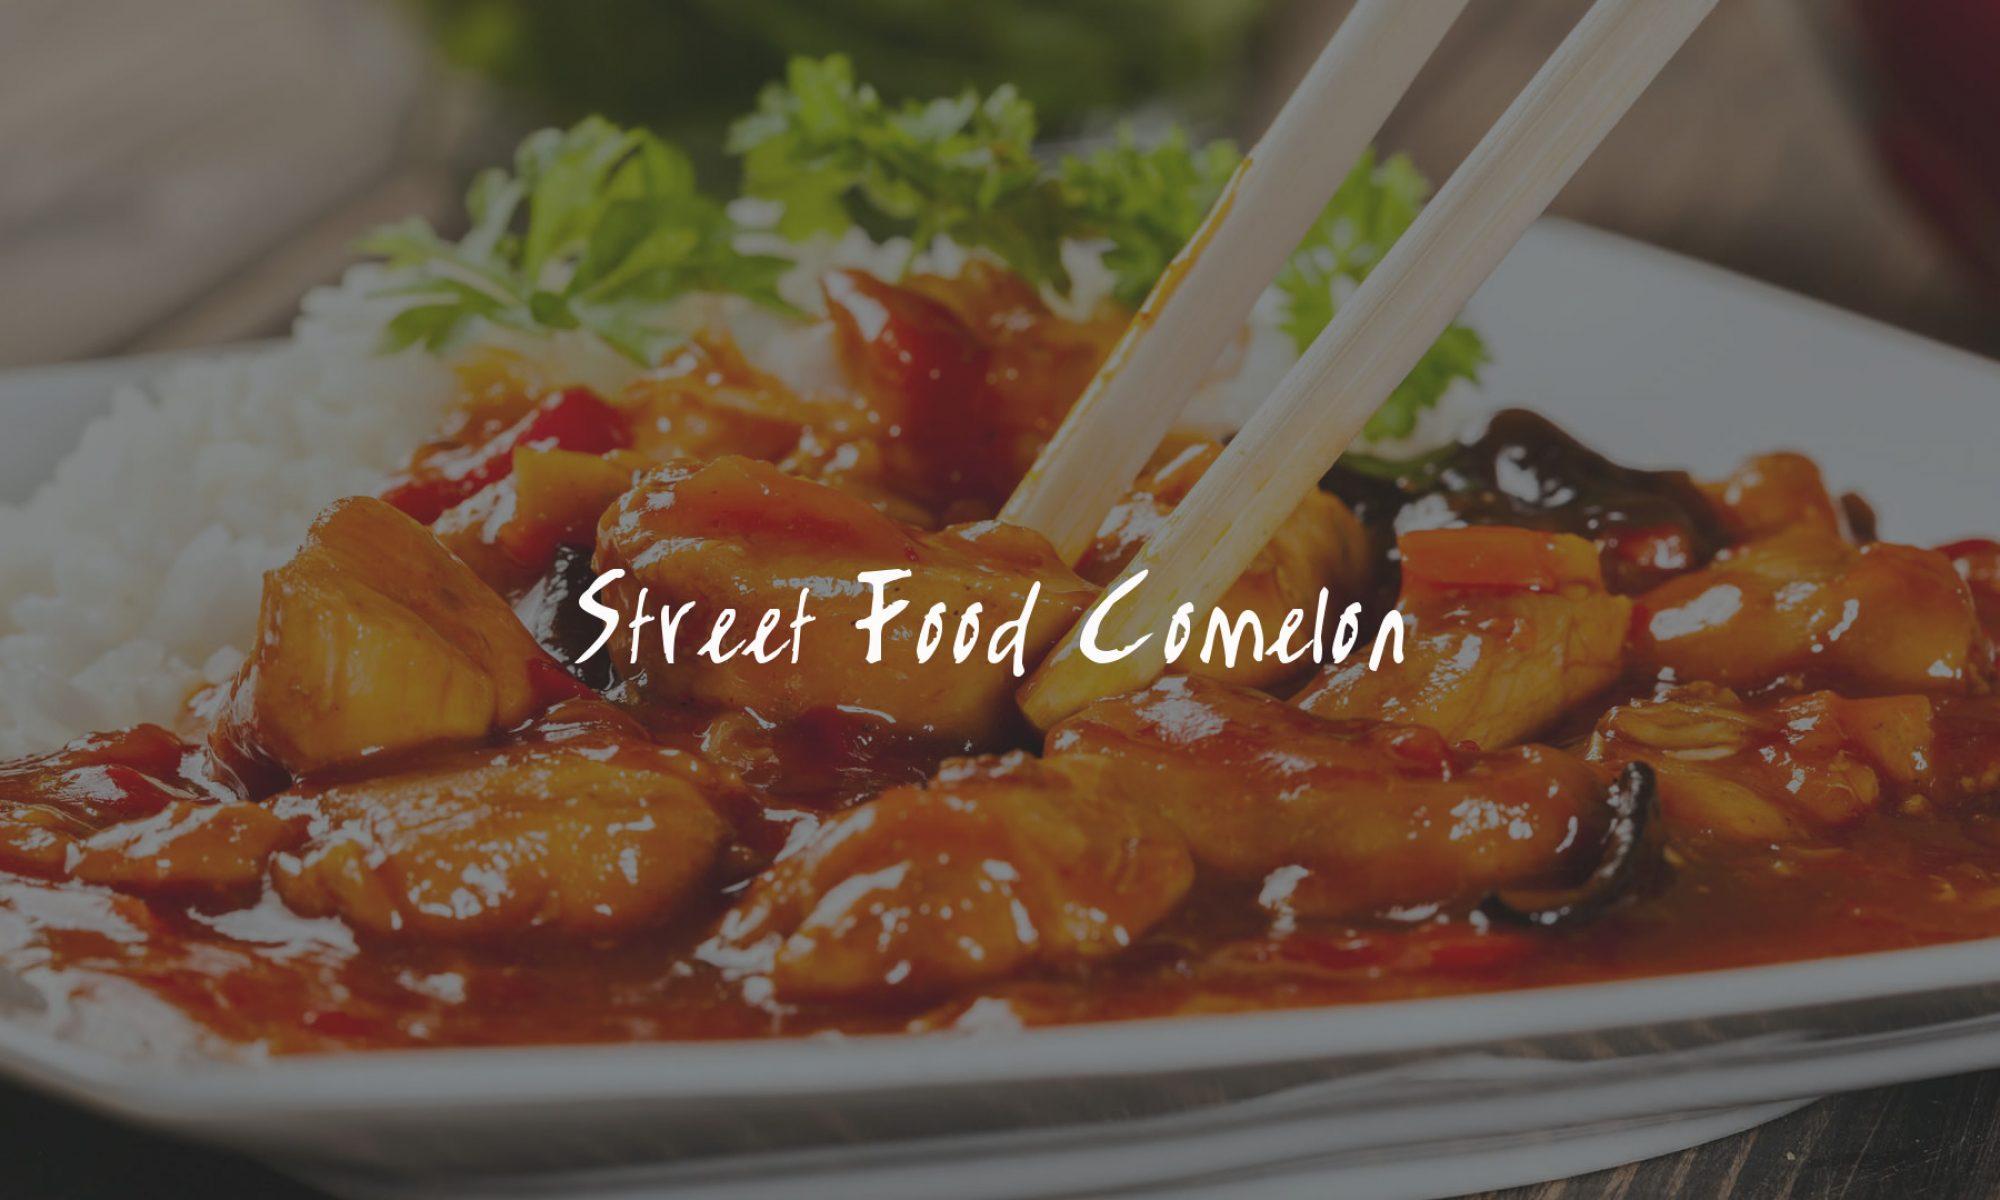 Restaurante Street Food Comelon, comida rapida, desayunos, Almuerzo, fullbreakfast